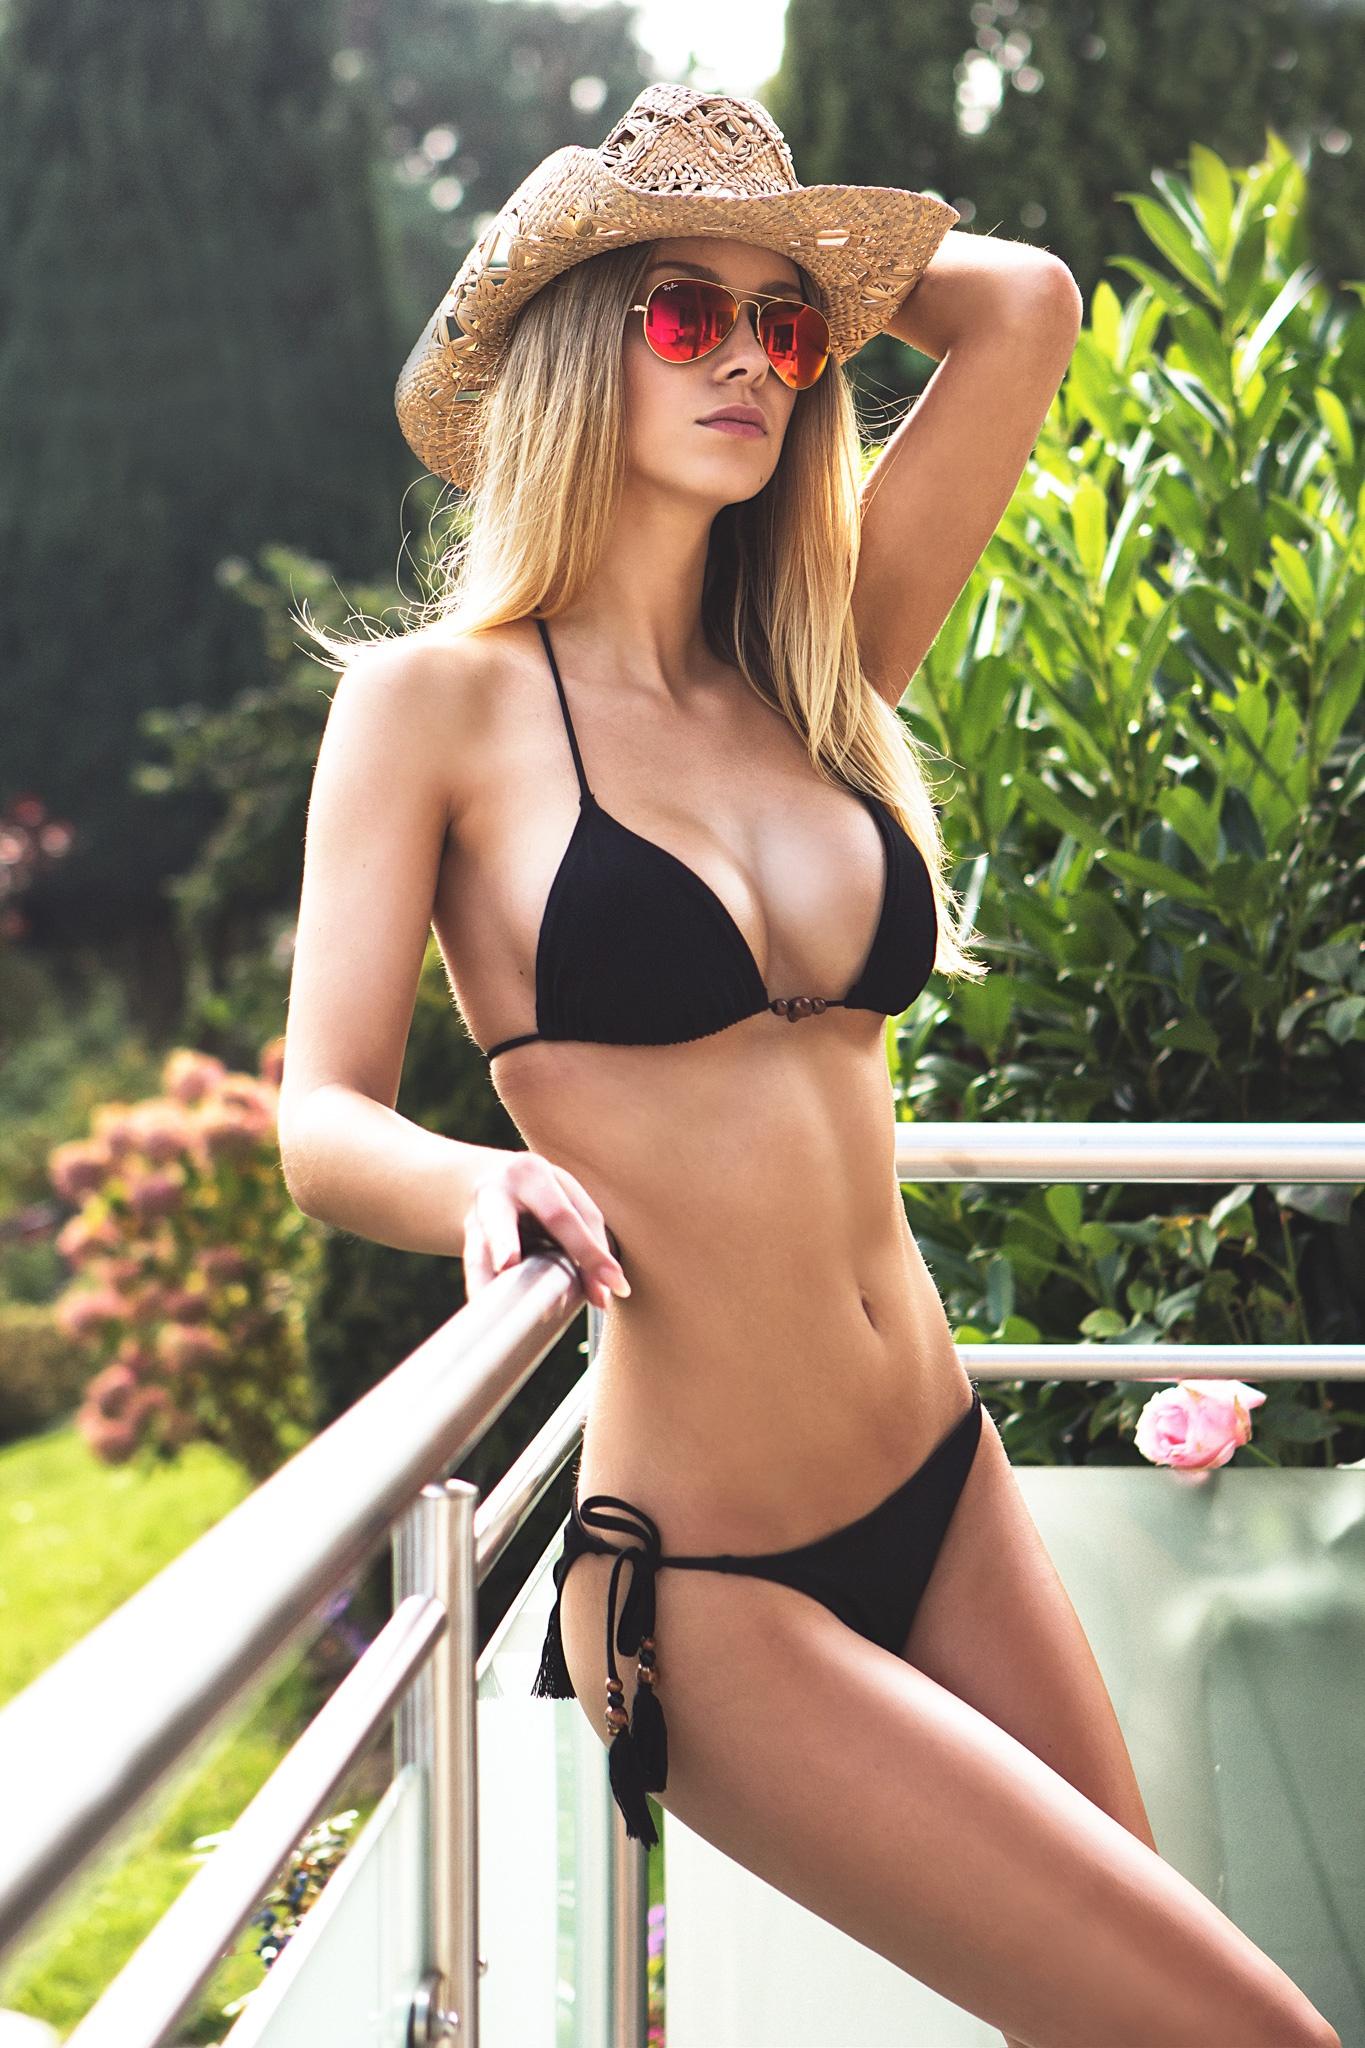 black swimsuit girl adorable sun glasses hay balcony